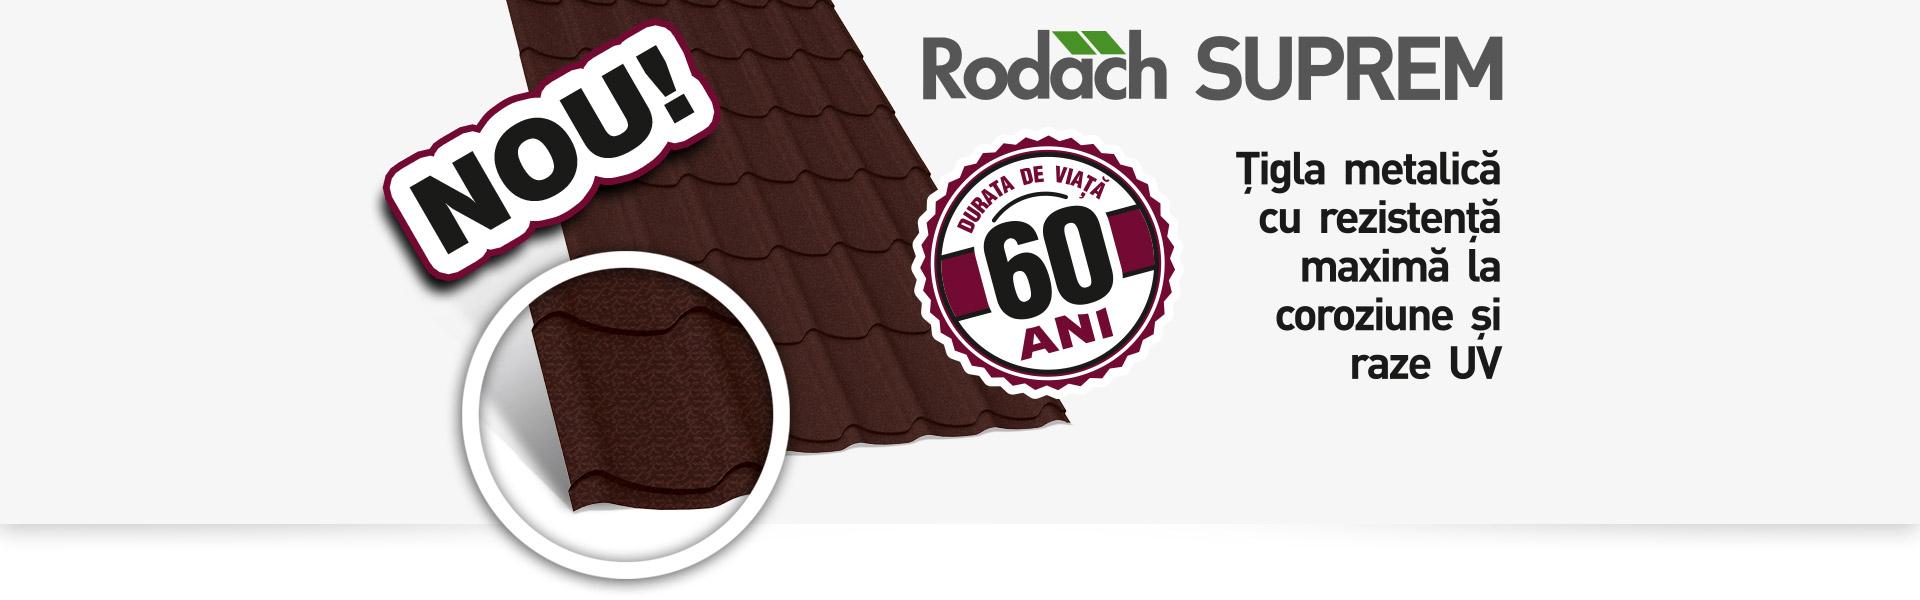 rodach-suprem-produs-wide